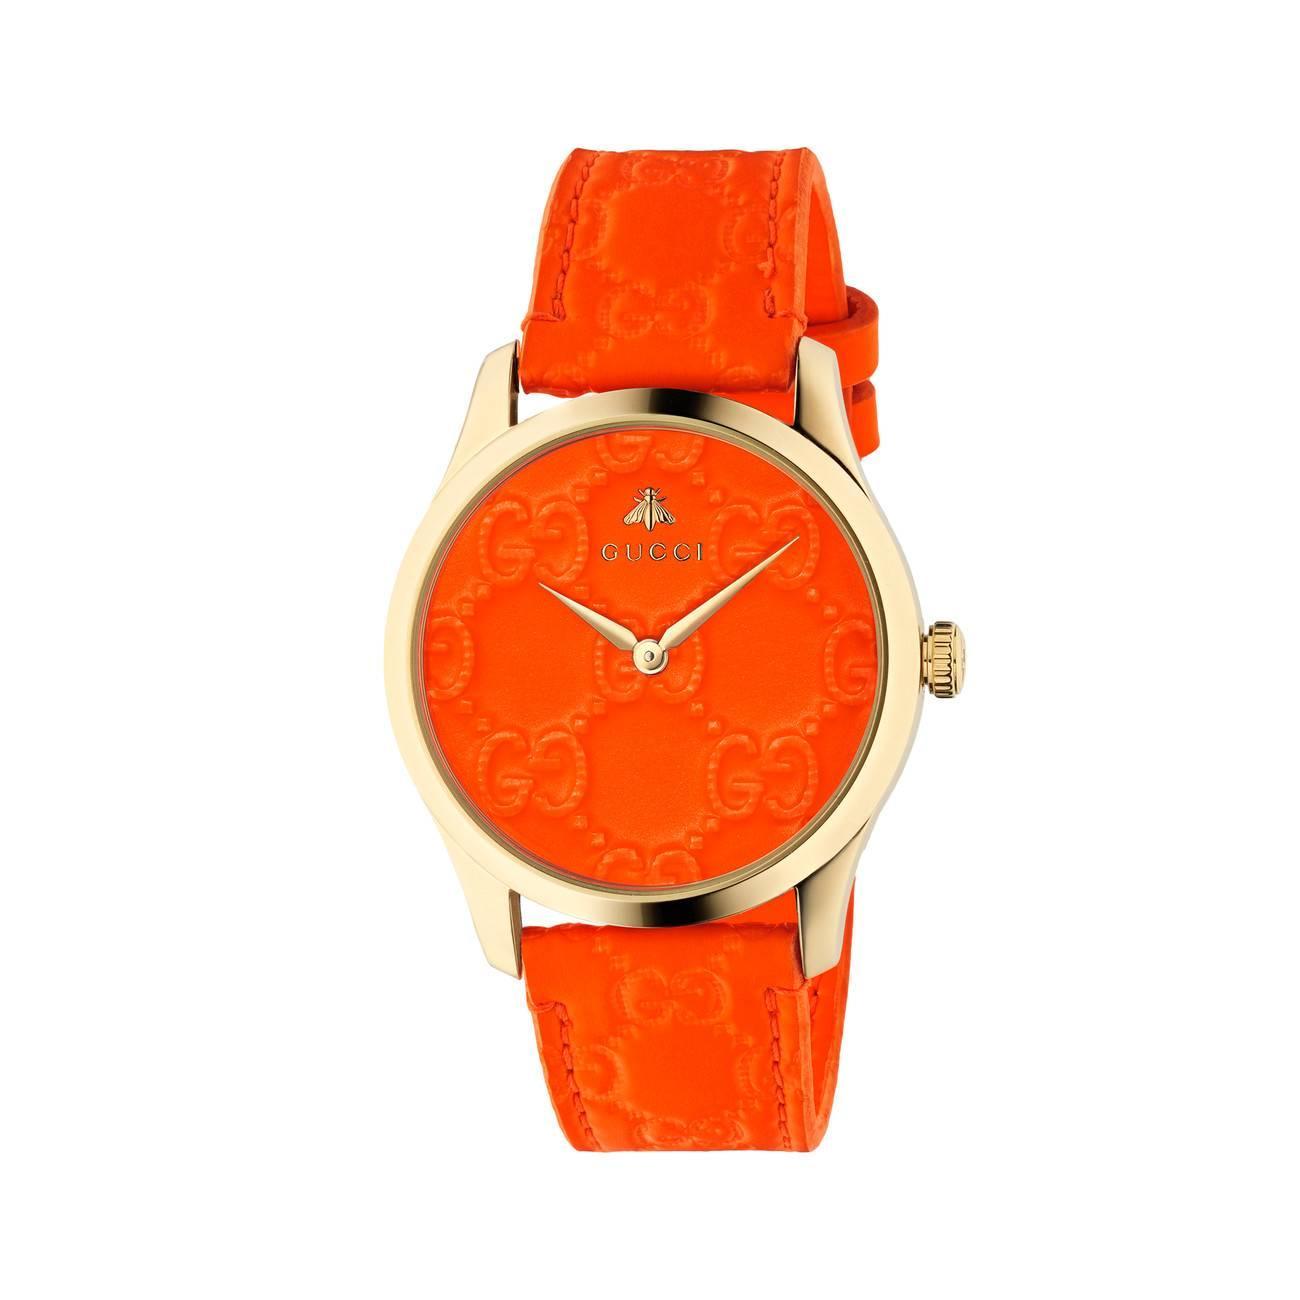 e5c50731fe1 Lyst - Gucci G-timeless Watch